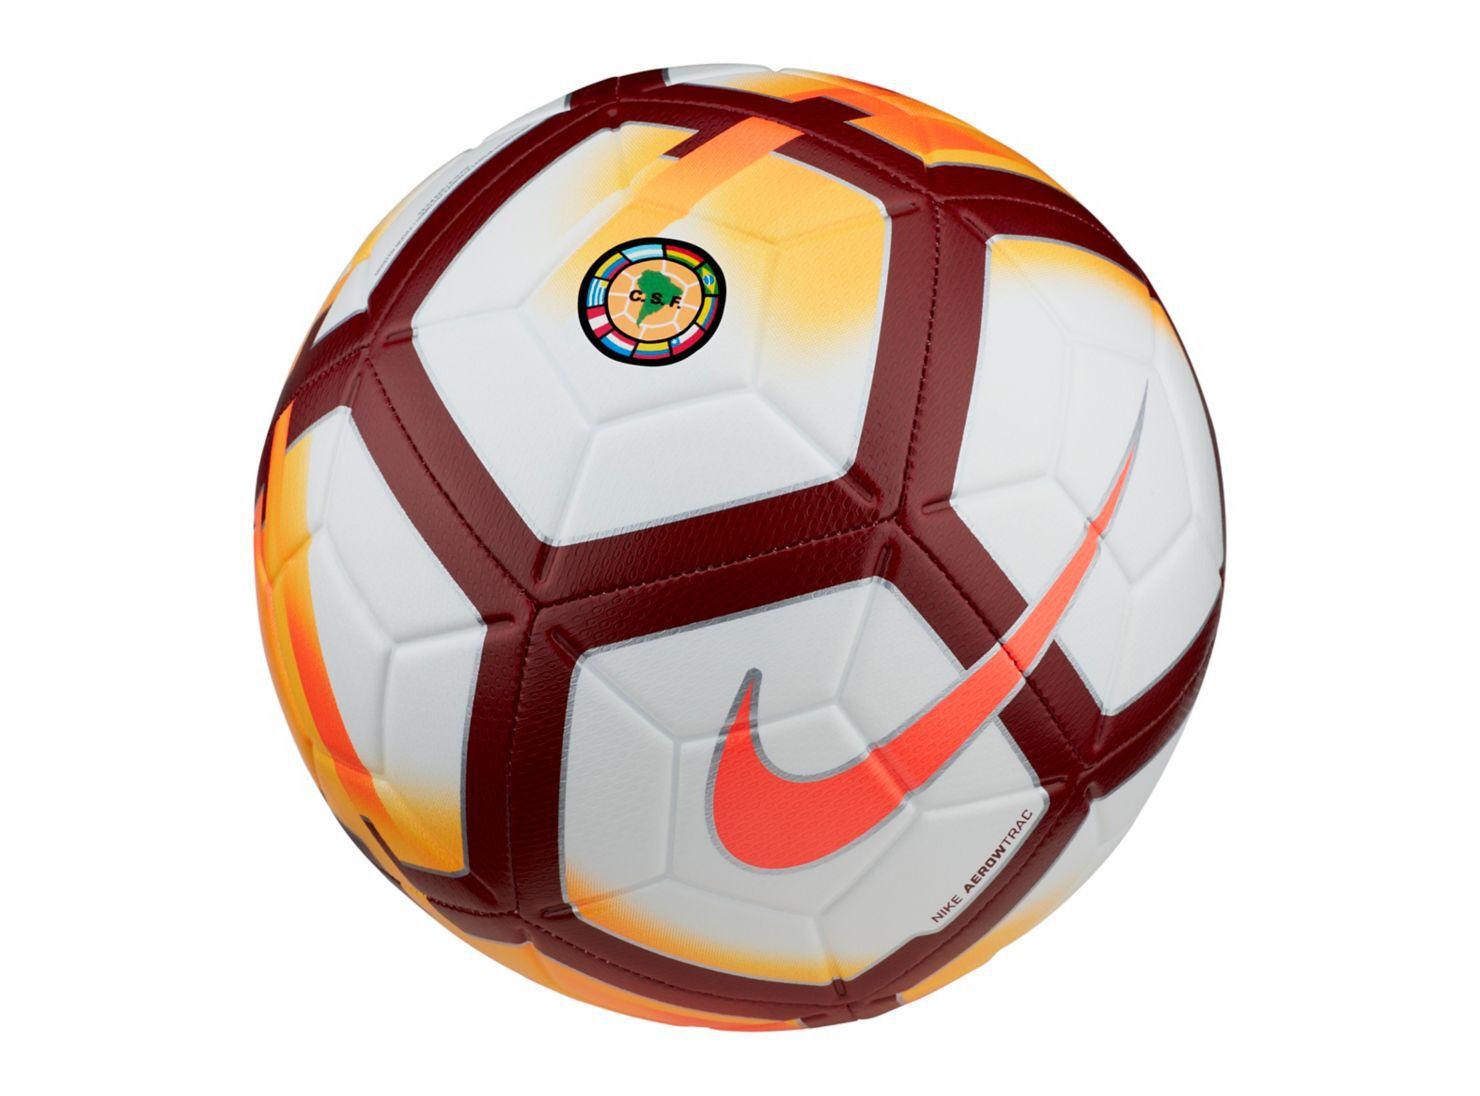 Images. Pelota de Fútbol Confederación Sudamericana Nike ... b04b97ede00d5